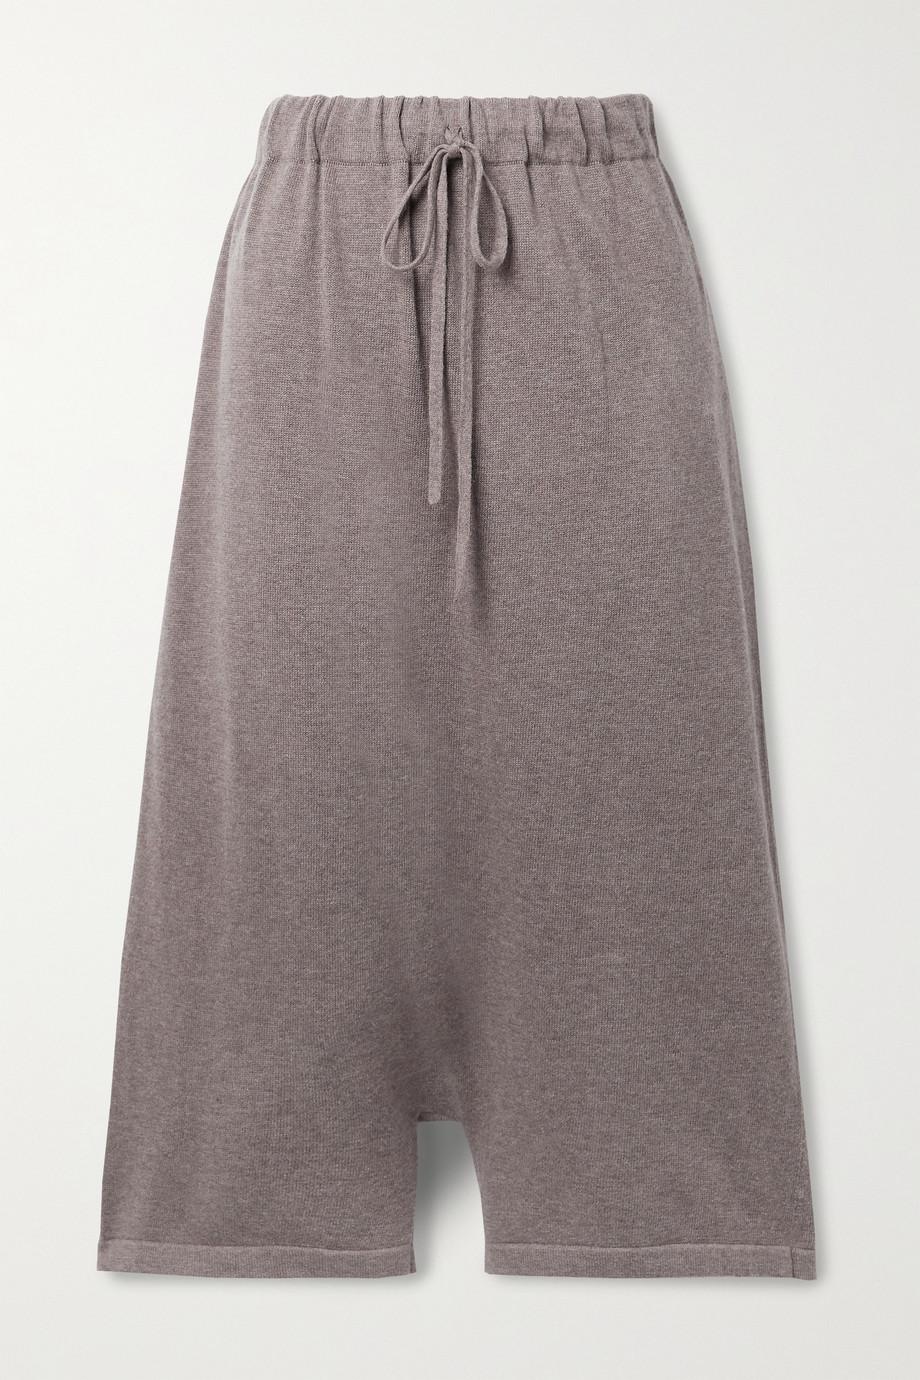 Lauren Manoogian New Playa cropped Pima cotton and alpaca-blend wide-leg pants